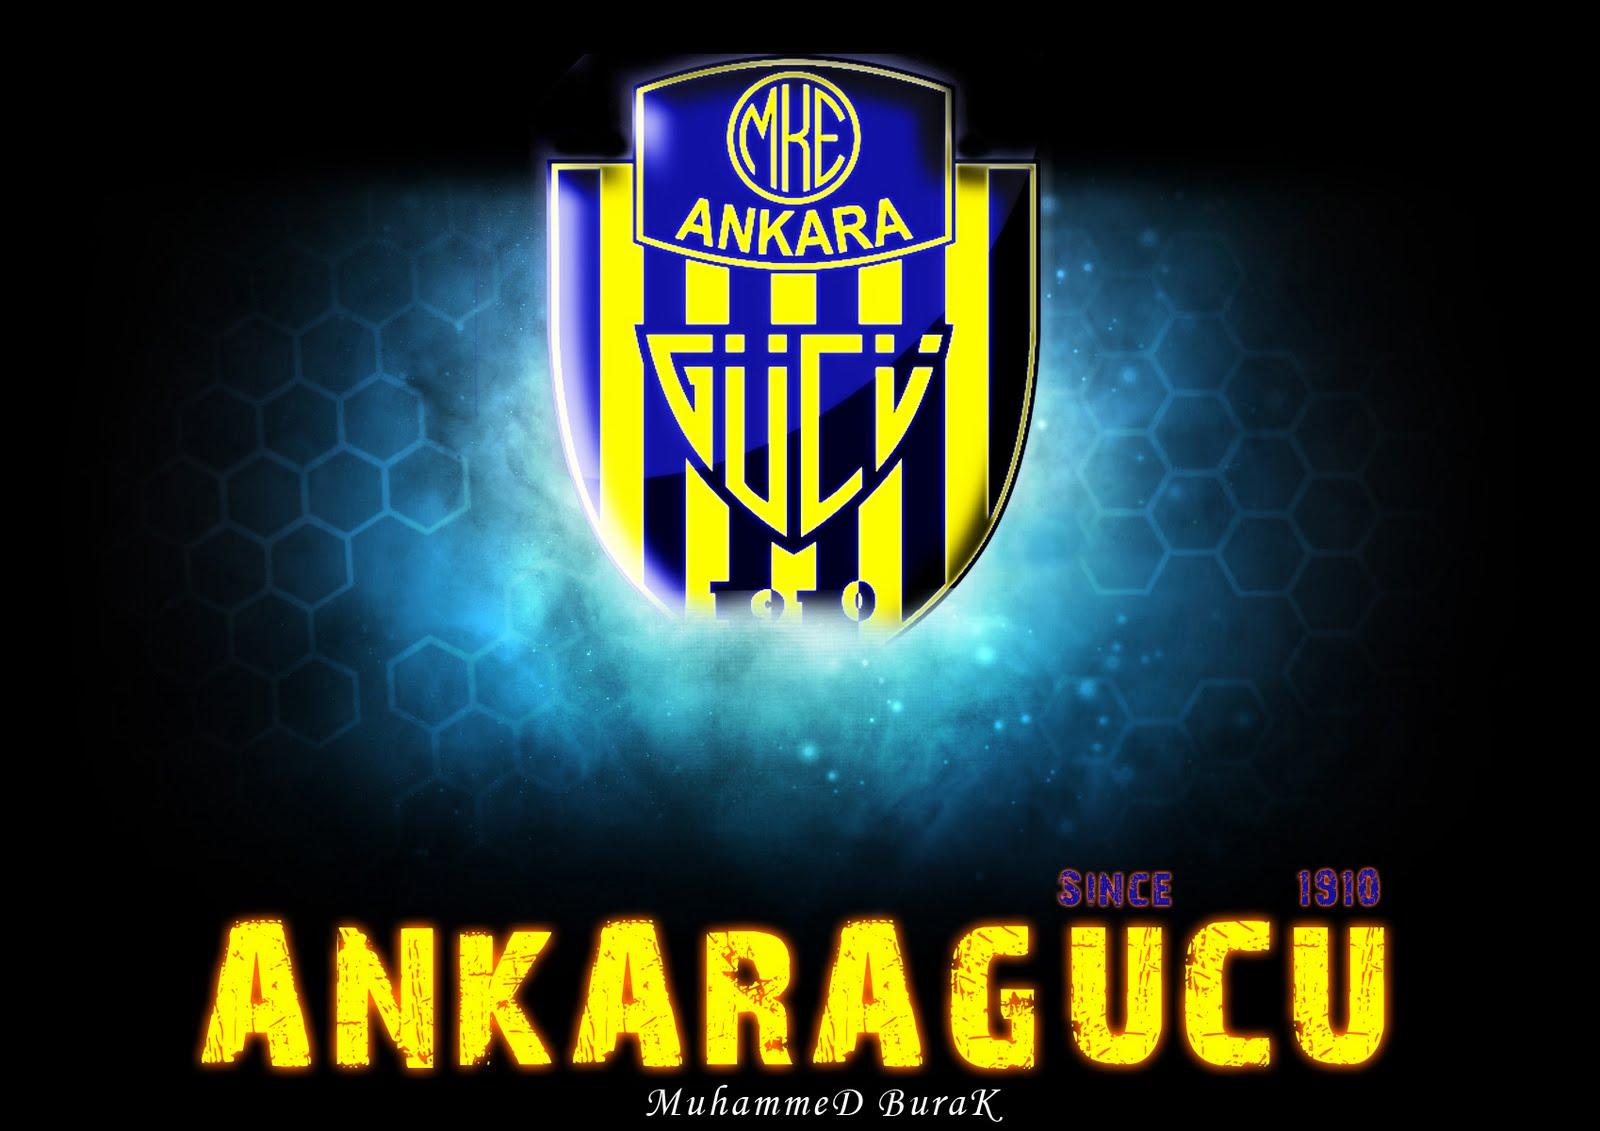 Ankarag U00fcc U00fc Resimleri Ankarag U00fcc U00fc Resimleri